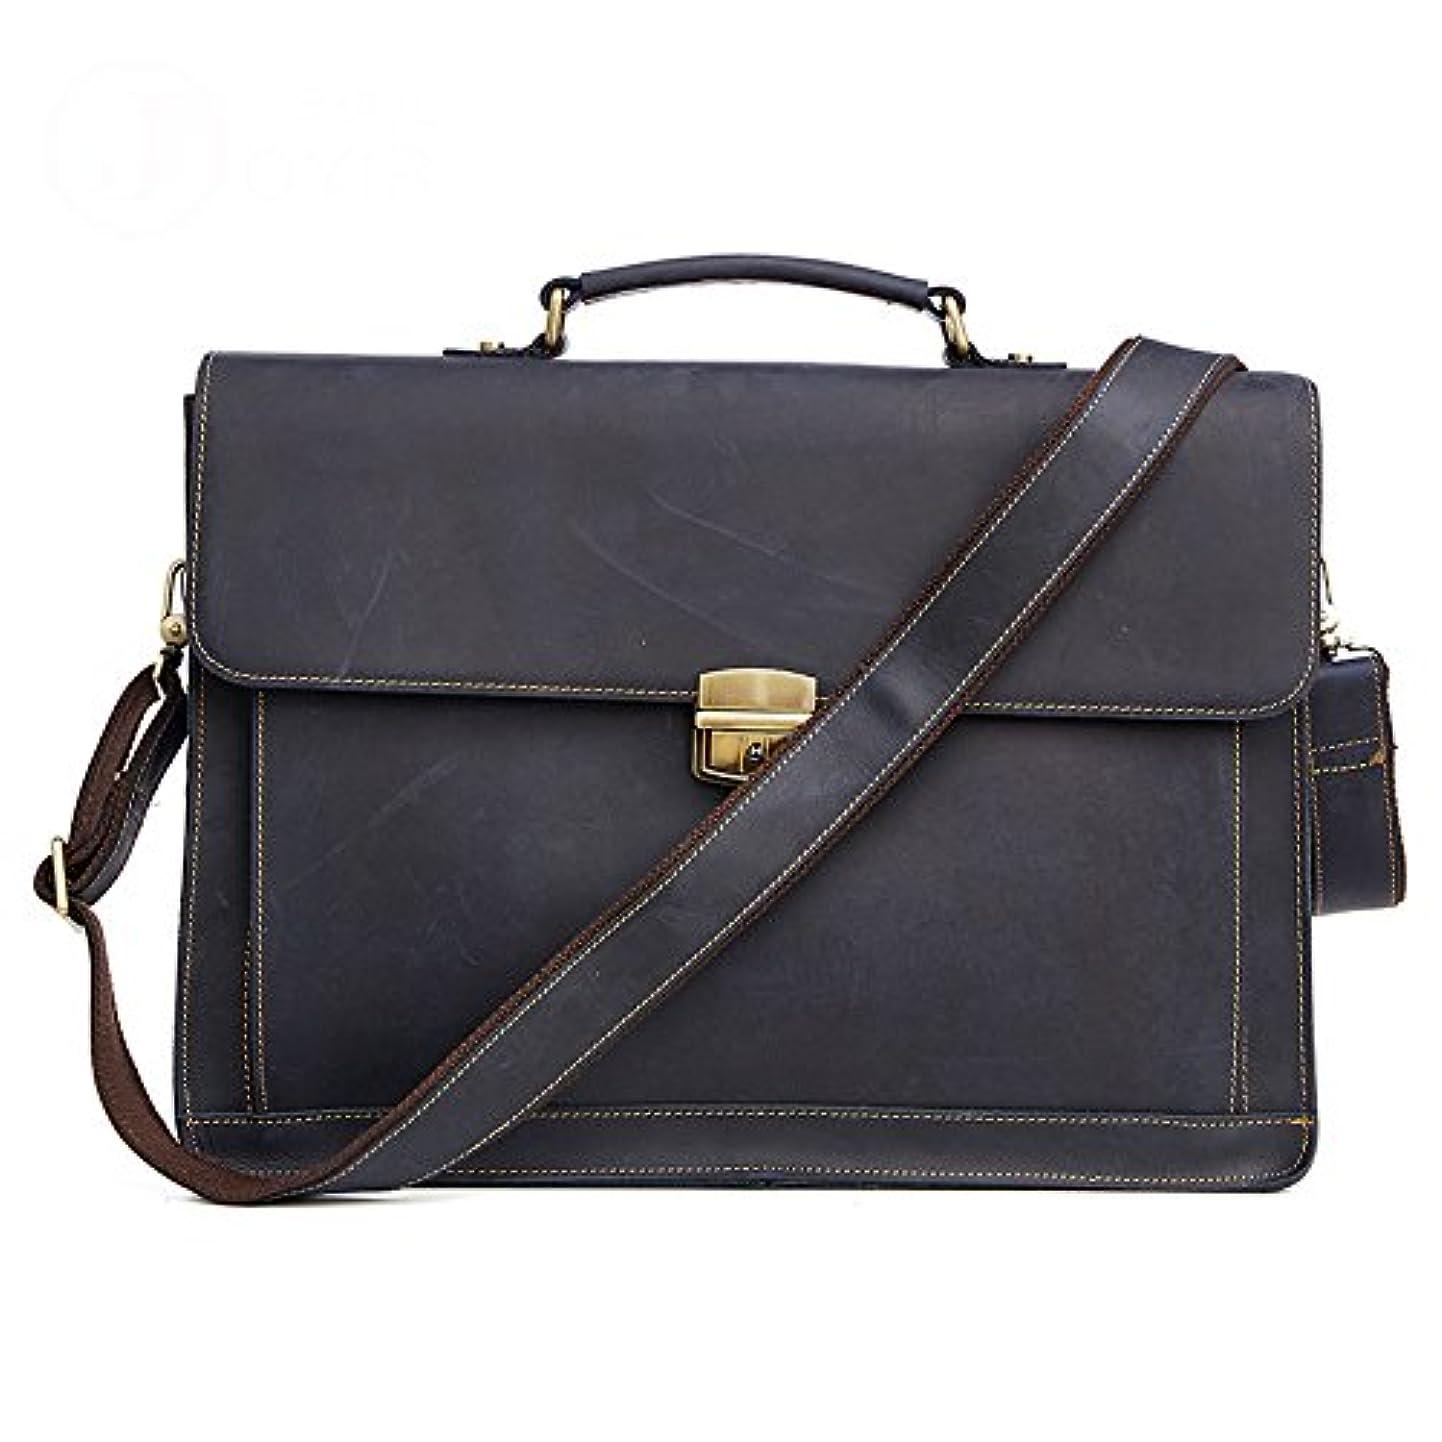 FGEFG Women Men's Leather 15.6 Inch Laptop Briefcase Bag Messenger Shoulder Satchel Casual Tote Crossbody Handbag (Color : Dark Blue) xsjwbmclblk8